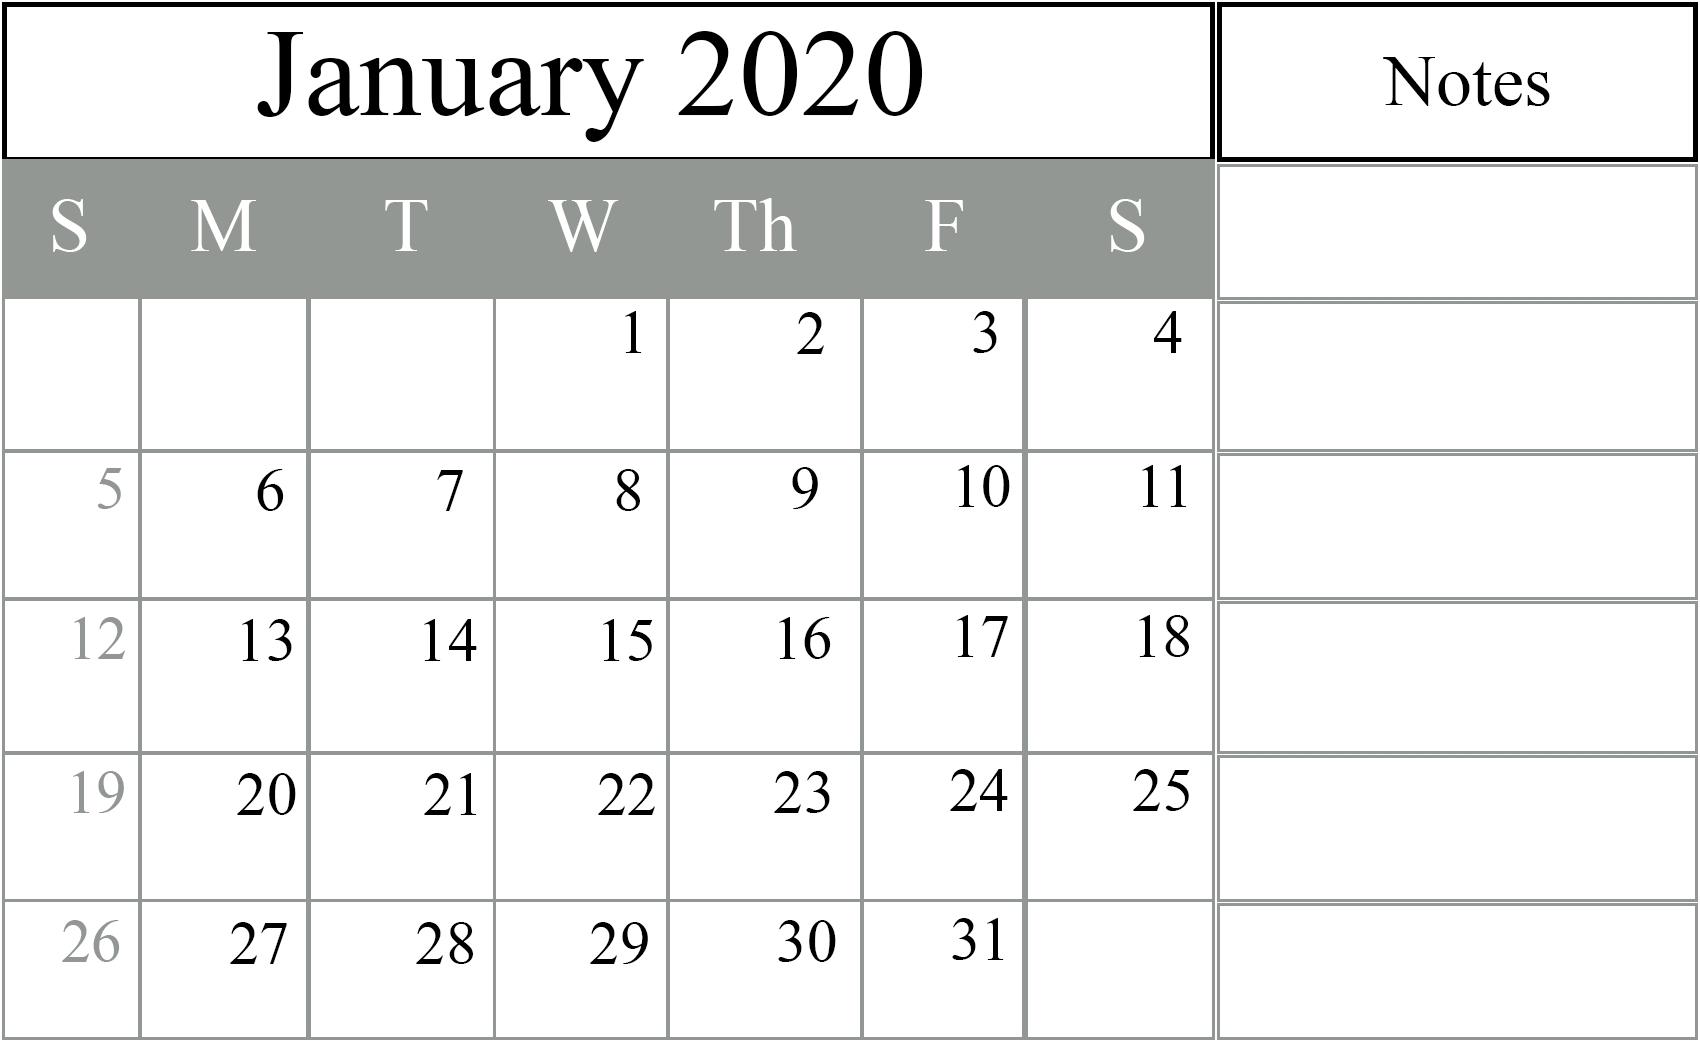 Free Printable January 2020 Calendar Editable In Pdf, Excel-January 2020 Calendar Editable